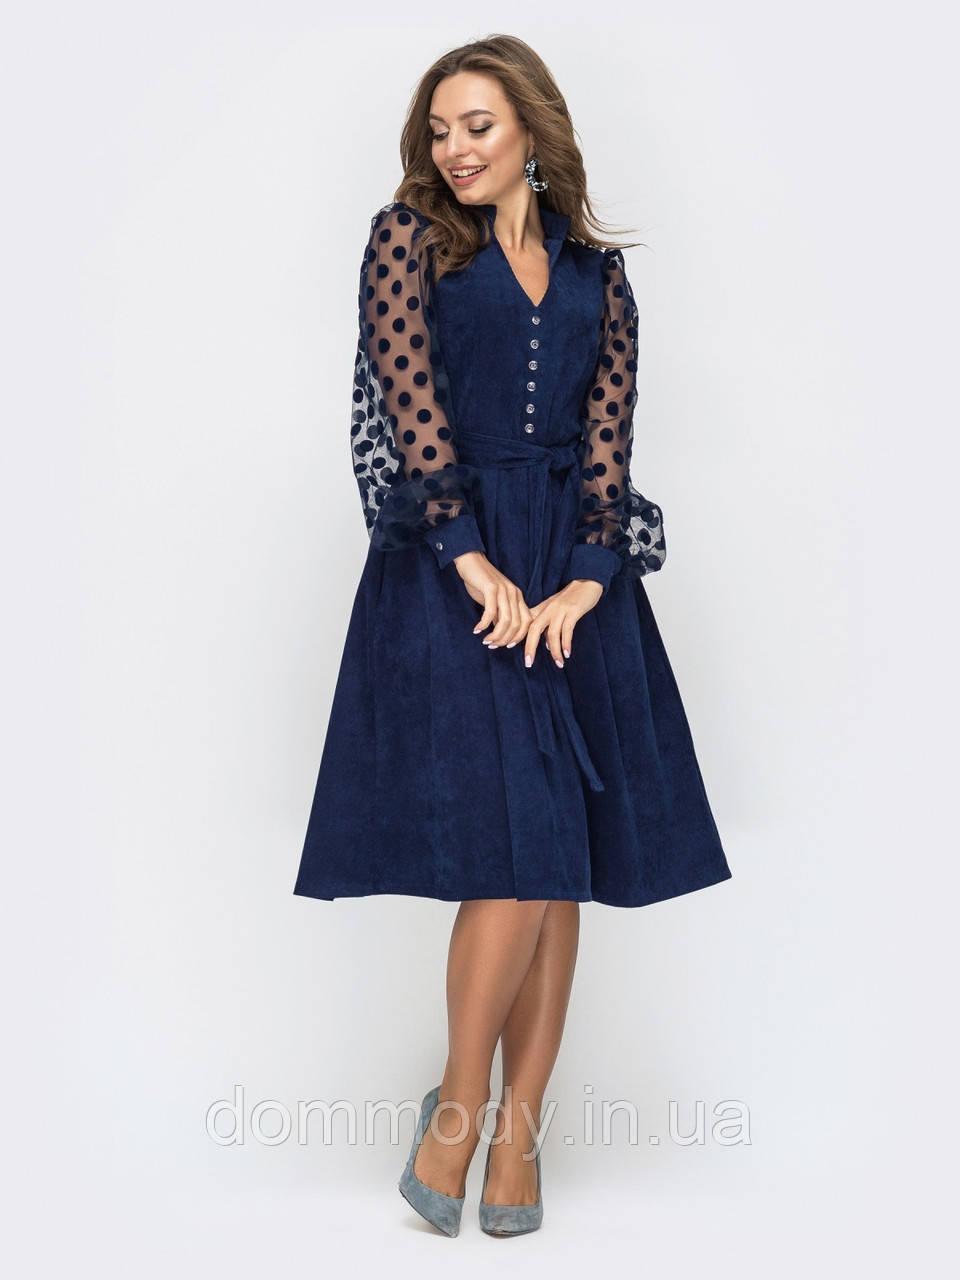 Платье женское Gracefulness velveteen